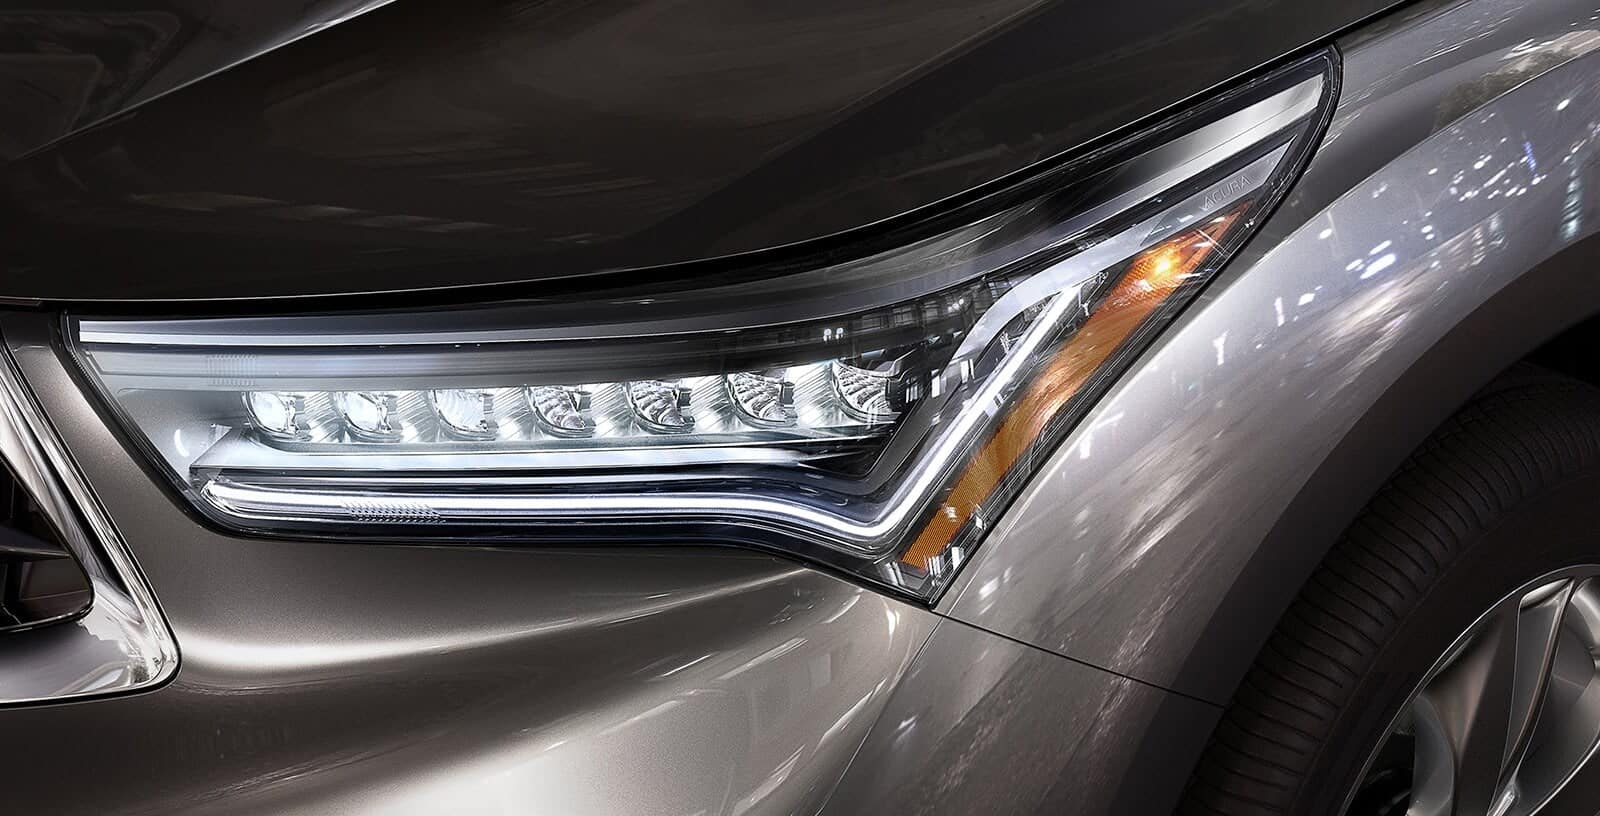 2020 Acura RDX headlight